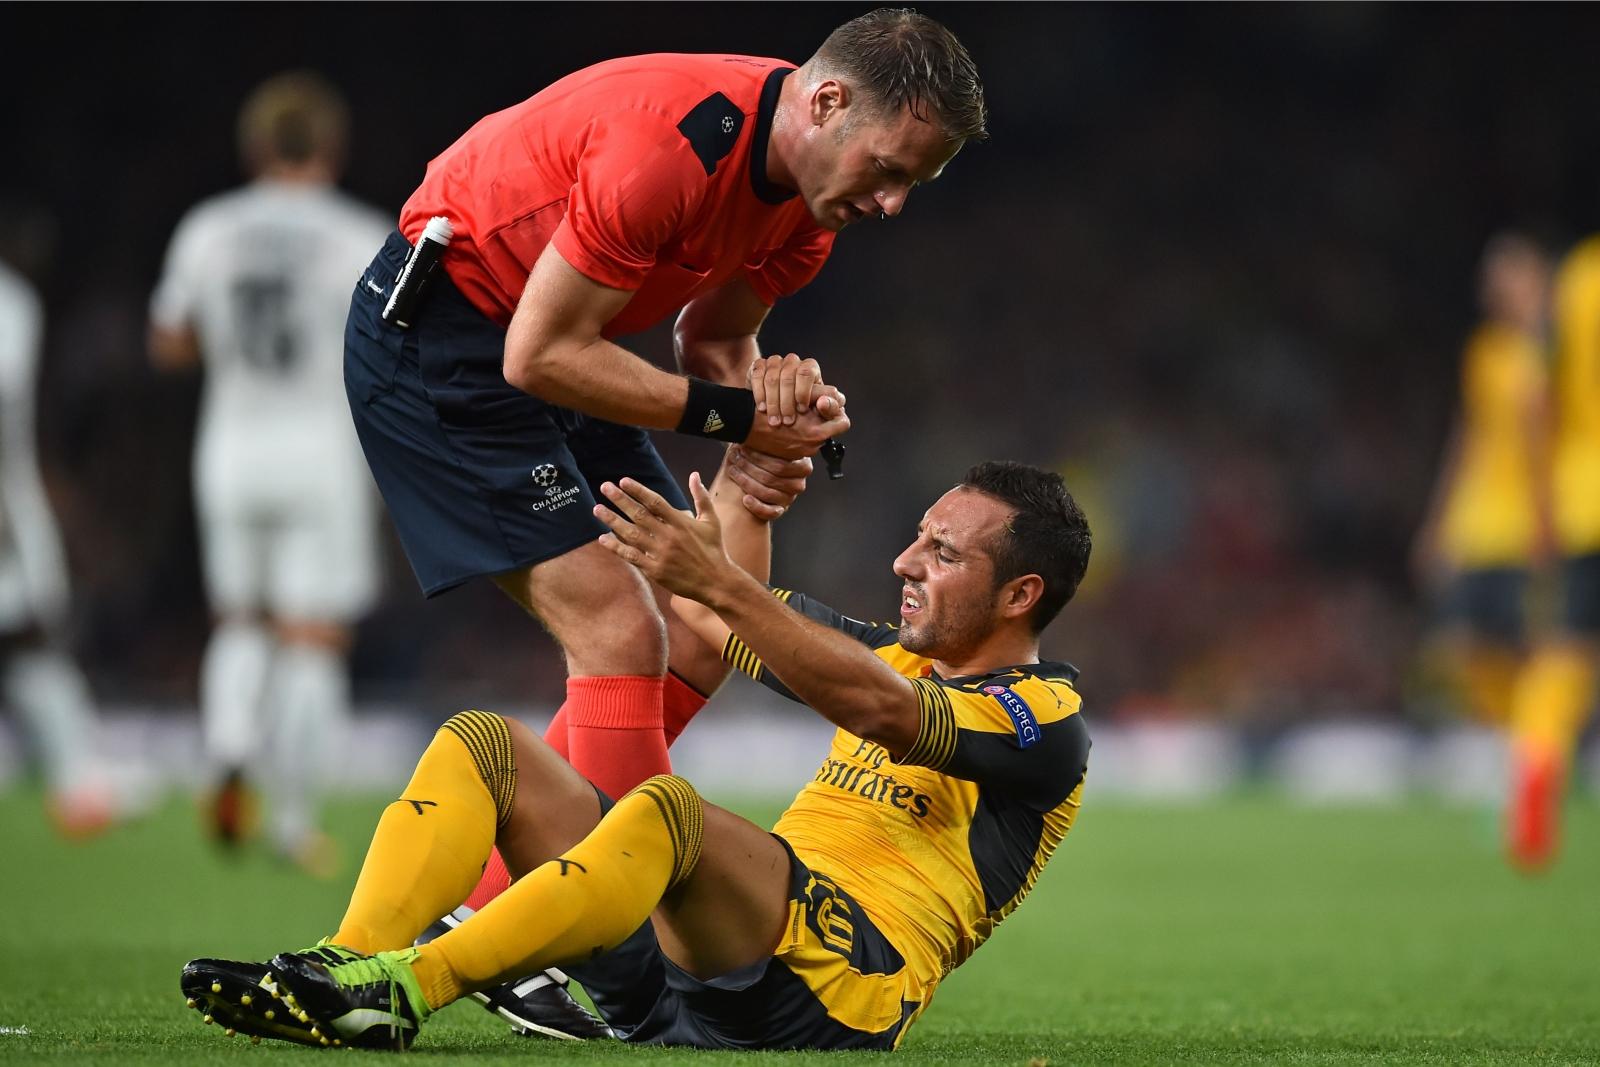 Santi Cazorla Arsenal star advised to undergo surgery to correct